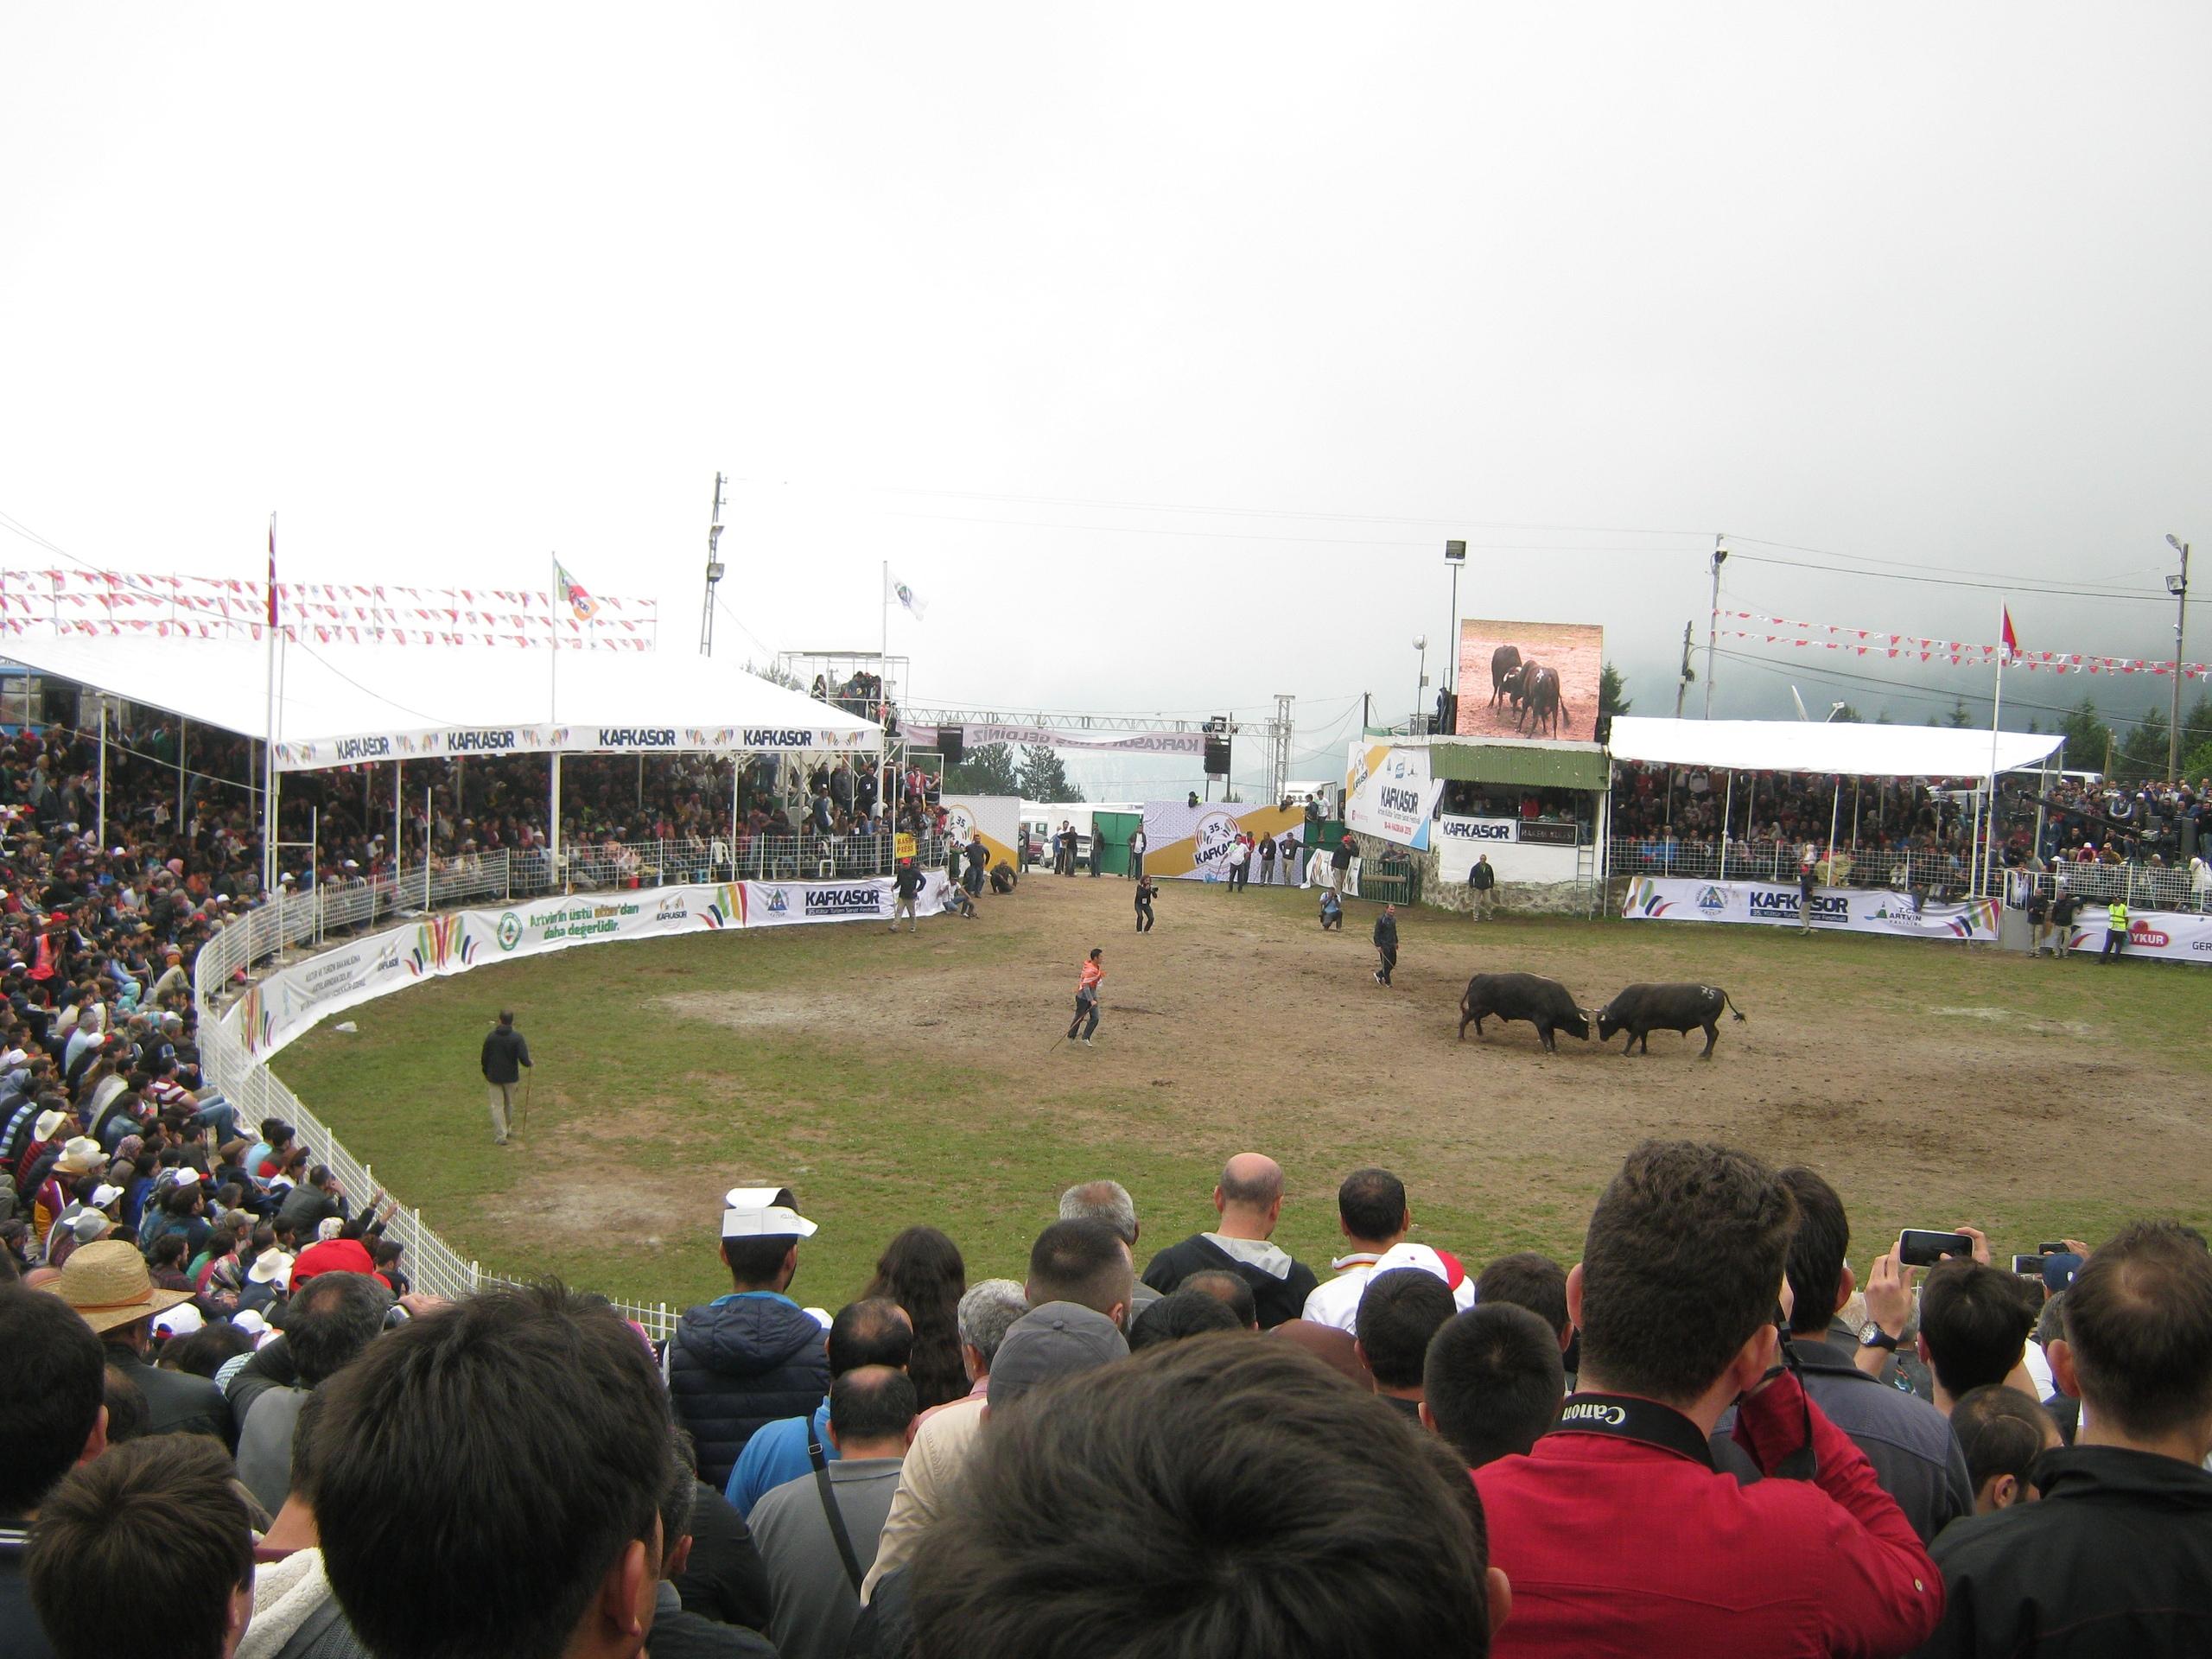 На фестивале Кафкасёр трёх-дневные бои быков